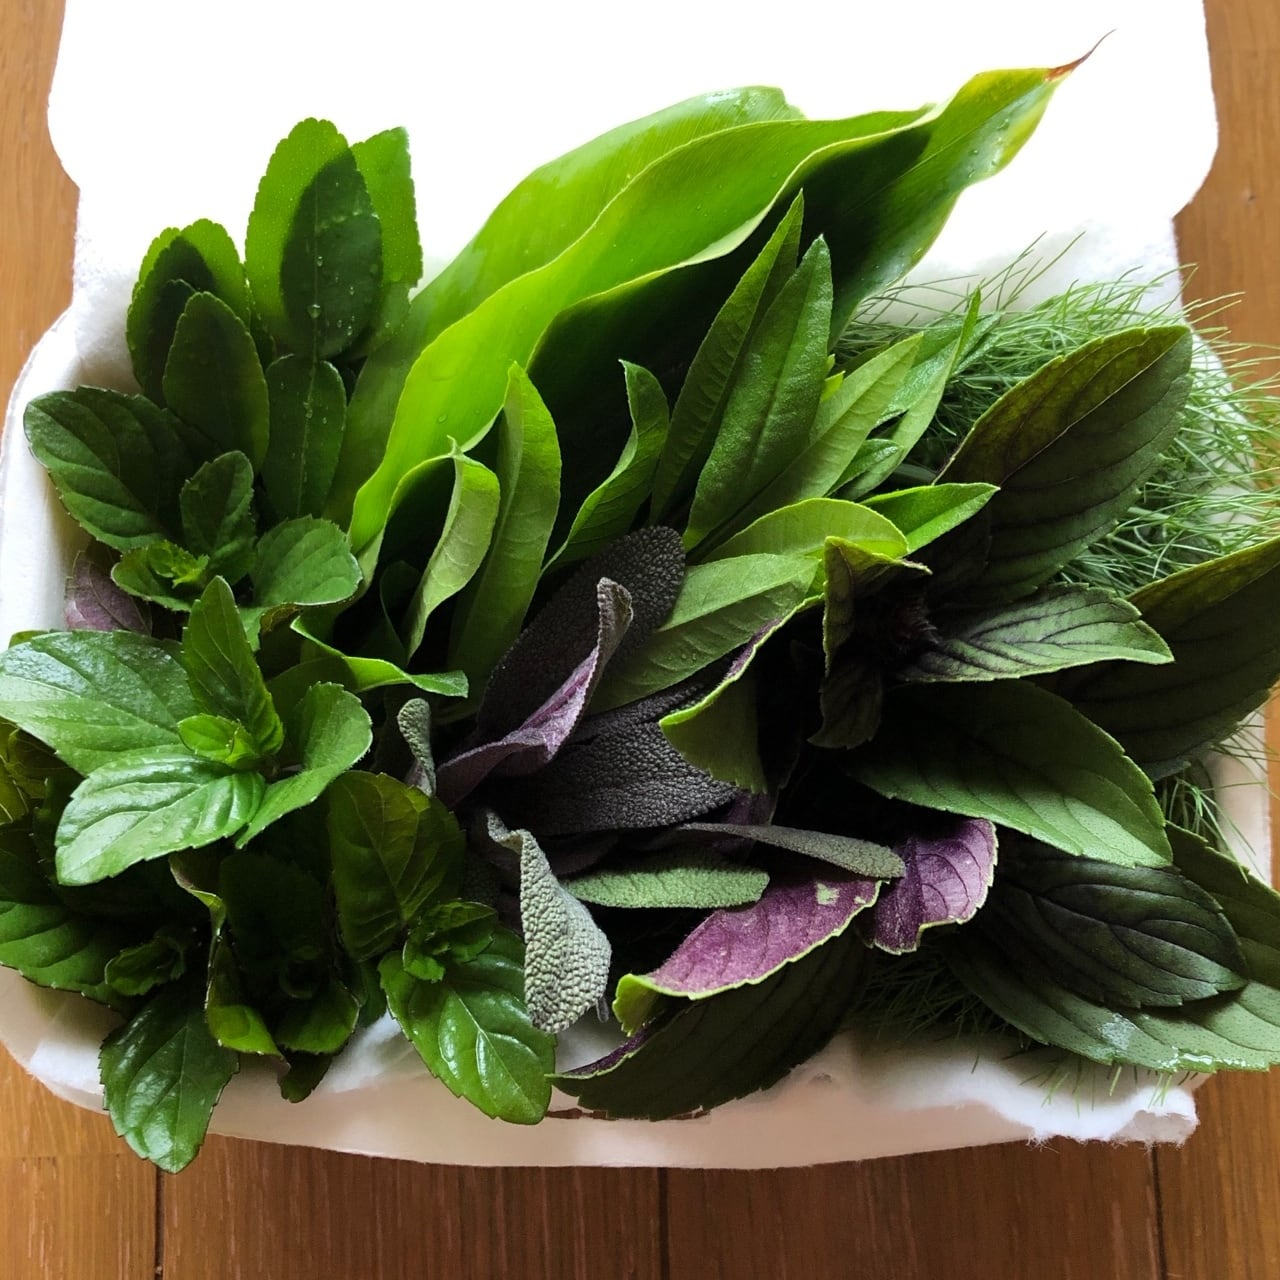 cooking herb mix  料理に使えるハーブミックス